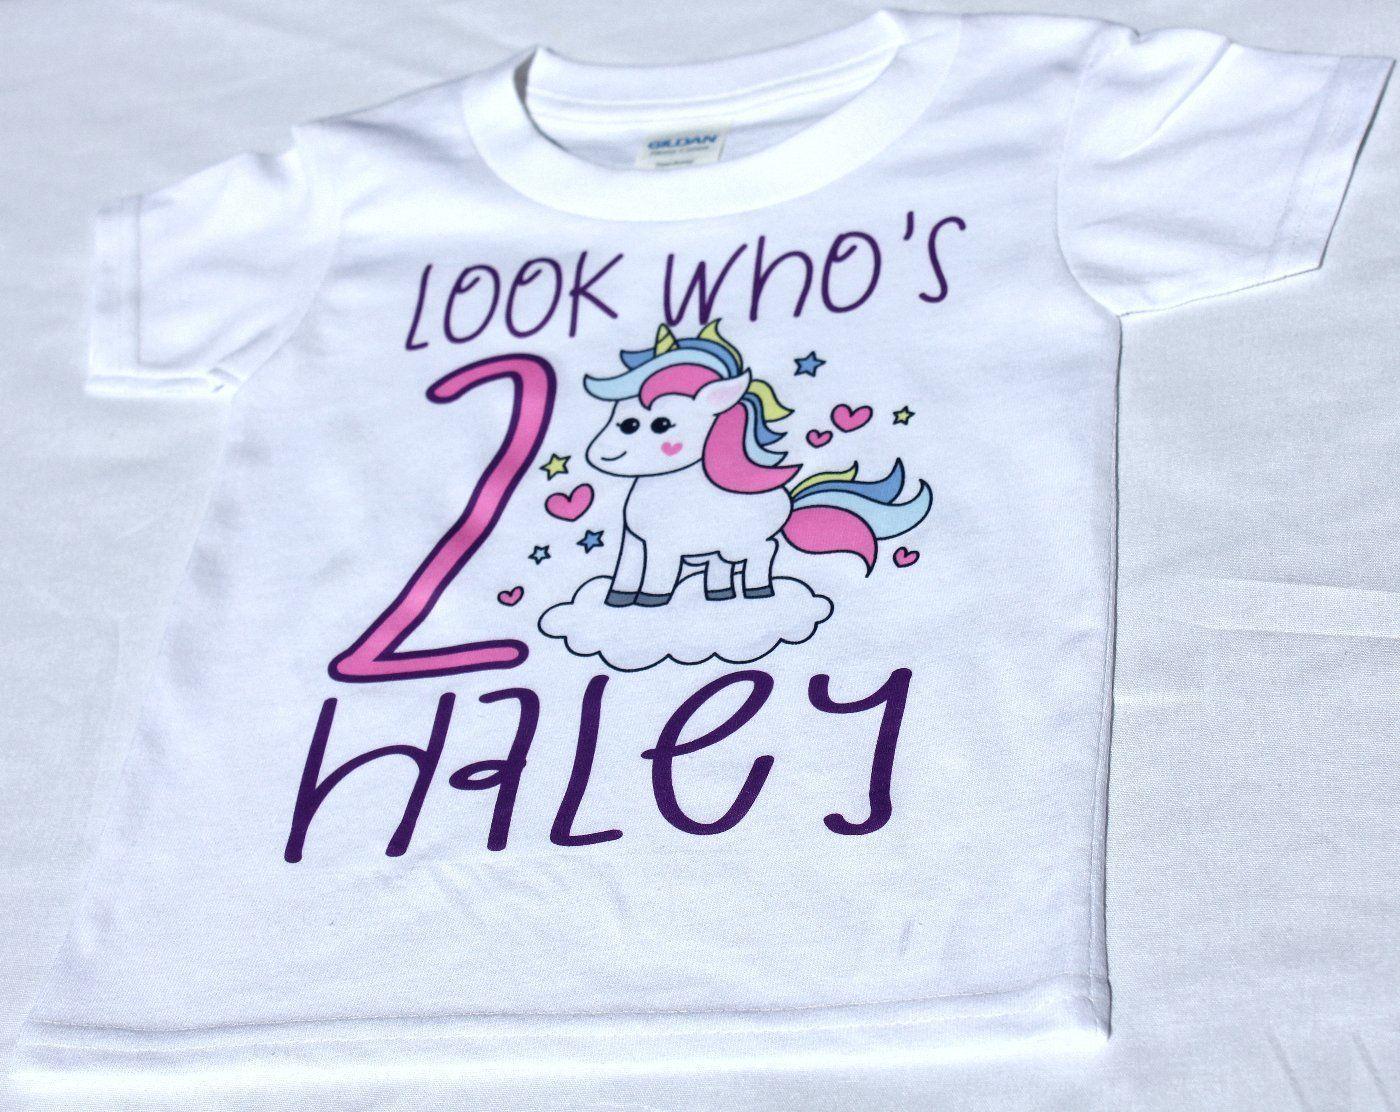 Look Who S Girls Kids Youth Unicorn Personalized Birthday T Shirt Tee Custom Name Age Cute Magic Gift Design 3 Handmad Tee Shirts Shirts Personalized Birthday,2018 Grand Design Solitude 375res